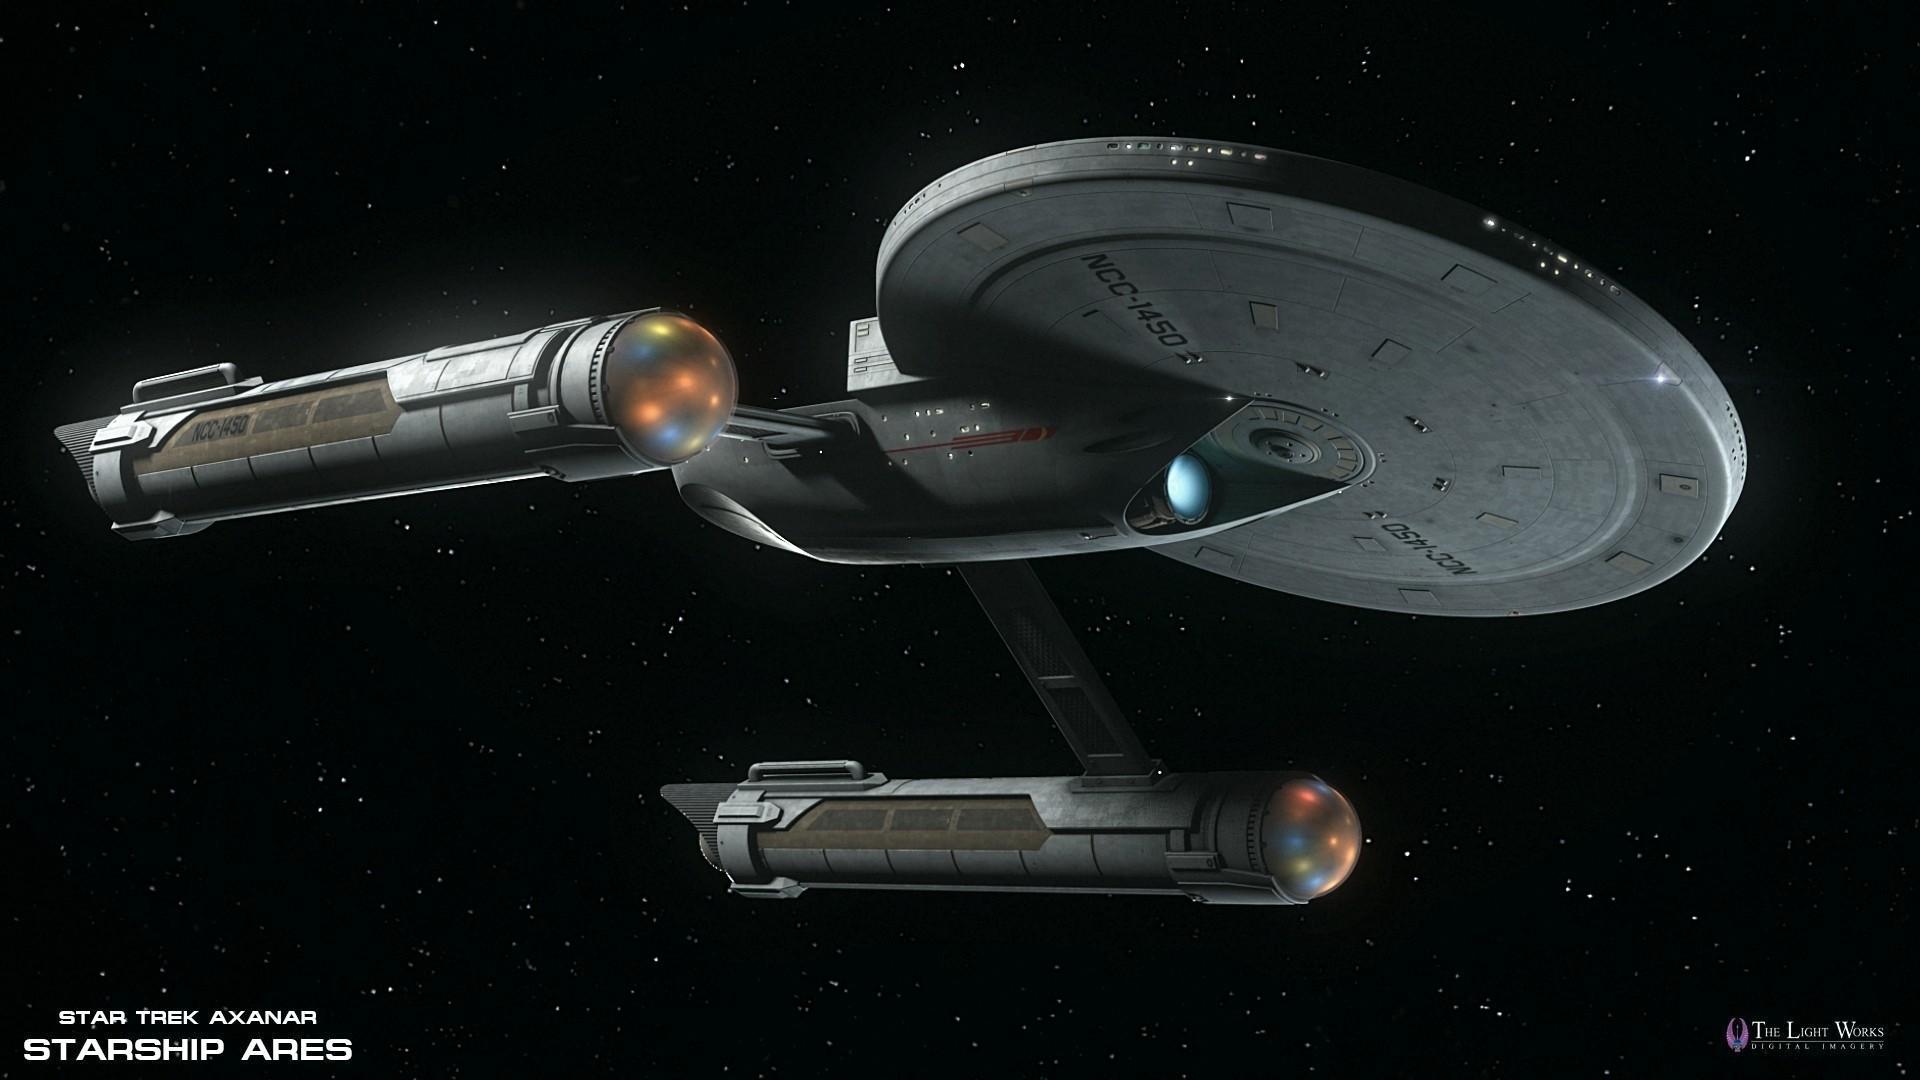 Star Trek Ship Wallpapers: Galaxy Class Starship Wallpaper ·① WallpaperTag